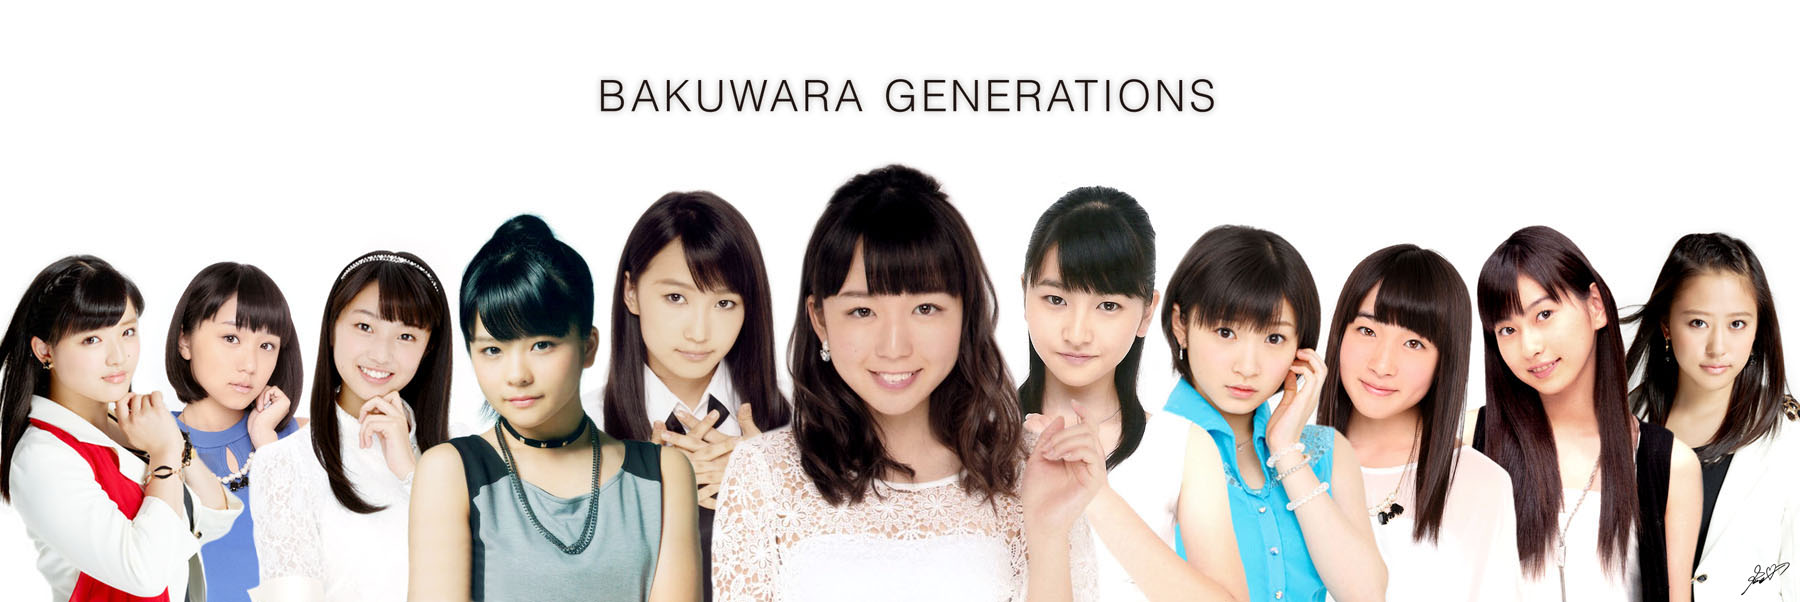 bakuwara.jpg